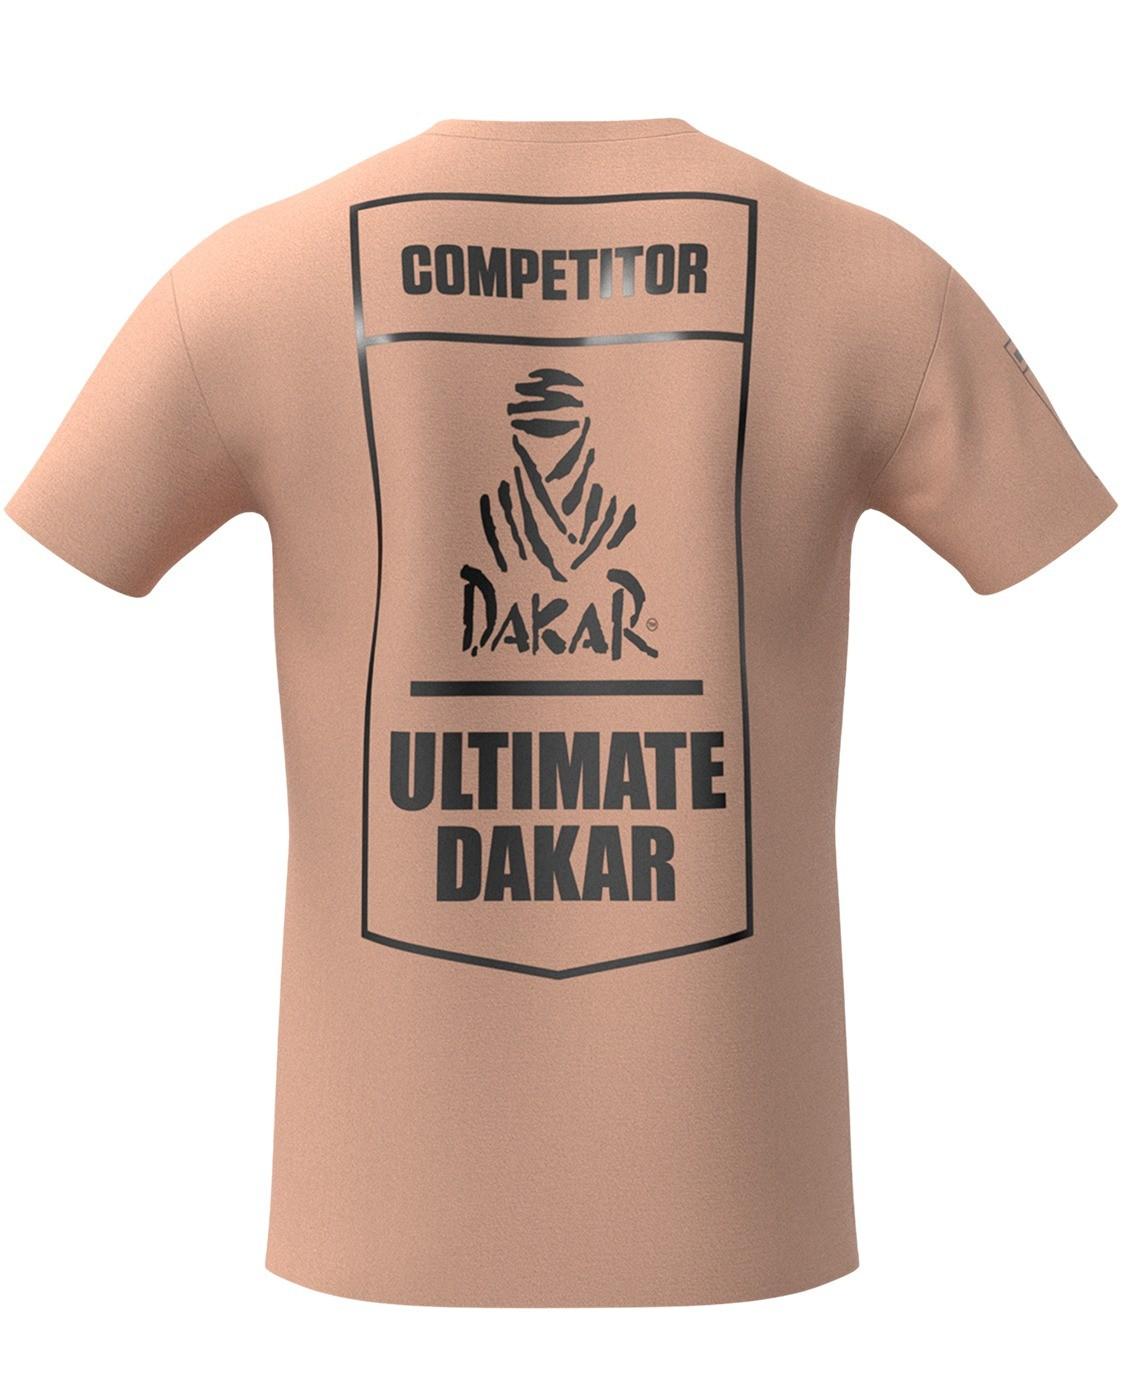 ULTIMATE DAKAR T-shirt Sand